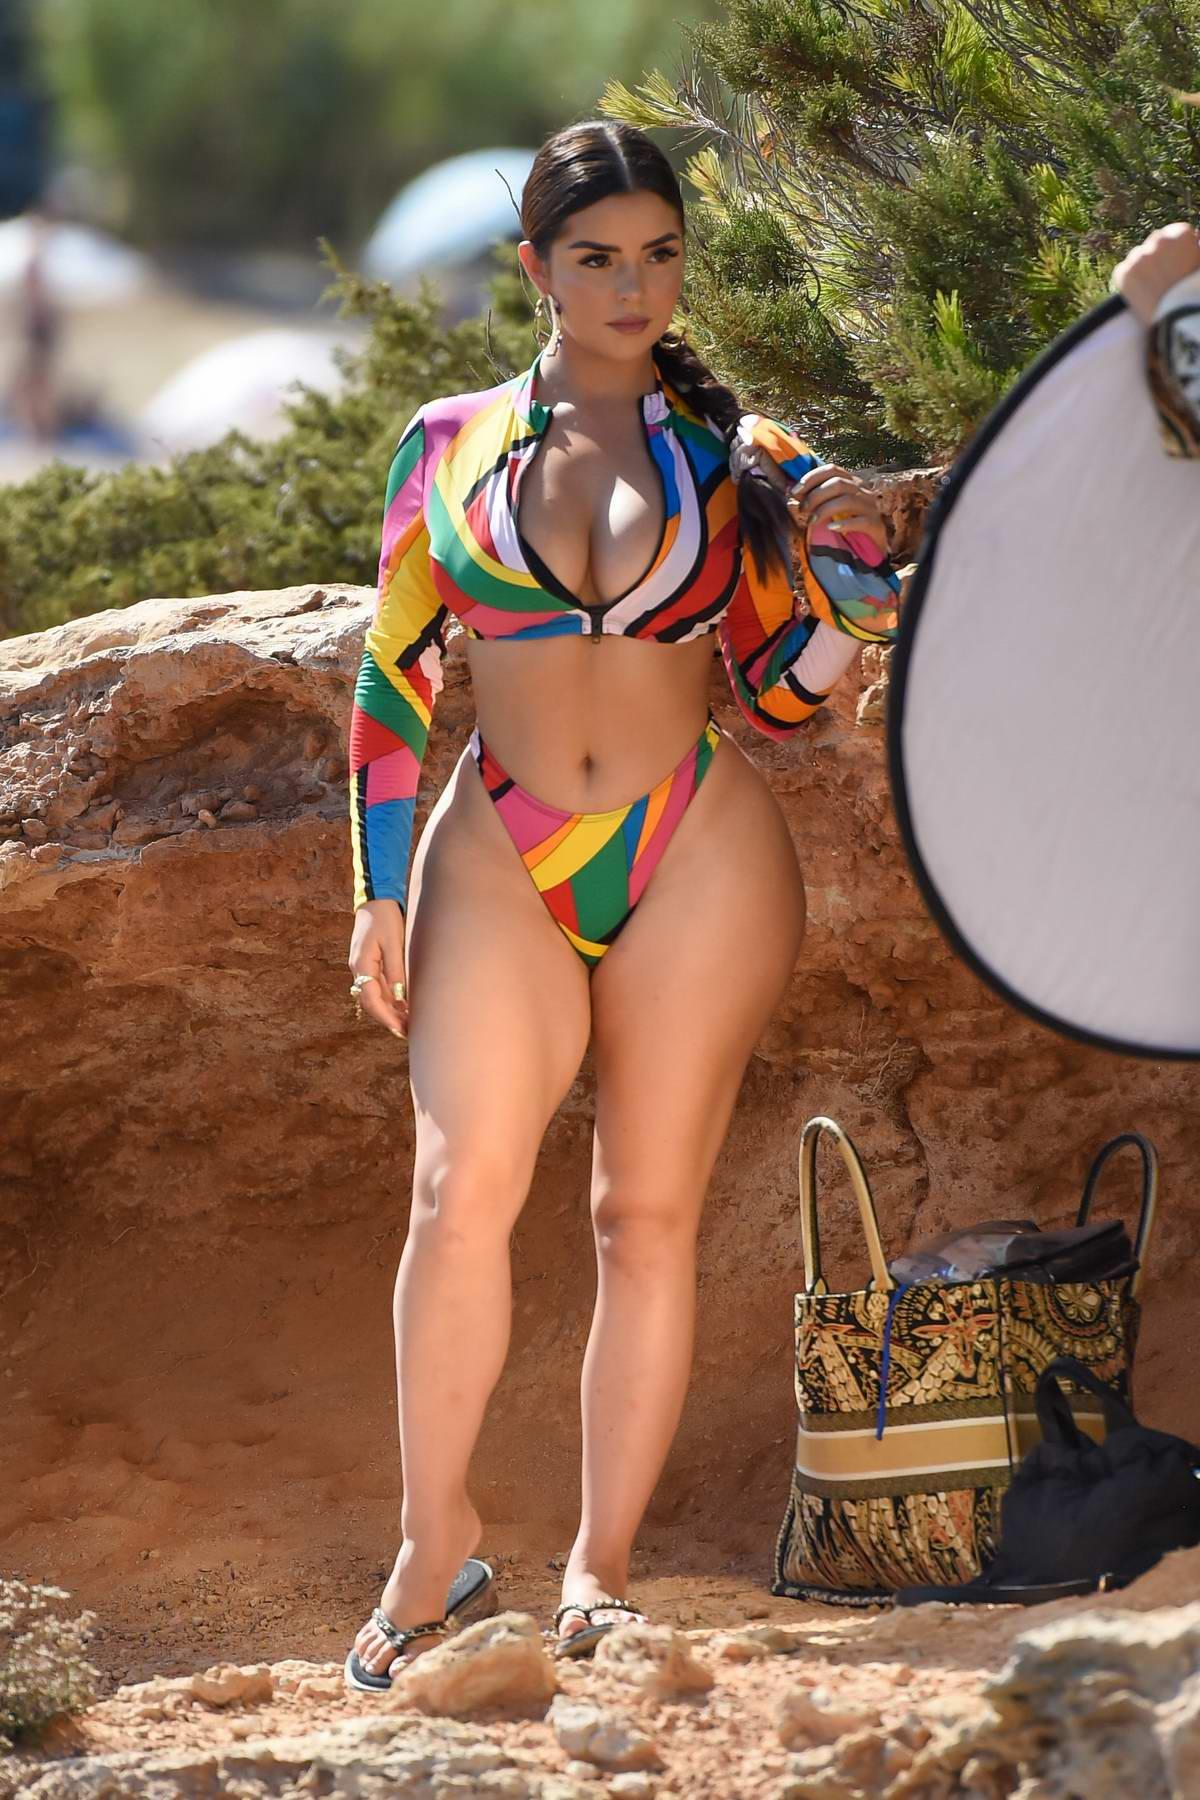 Demi Rose stuns in a colorful bikini while posing for a beach photoshoot in Ibiza, Spain